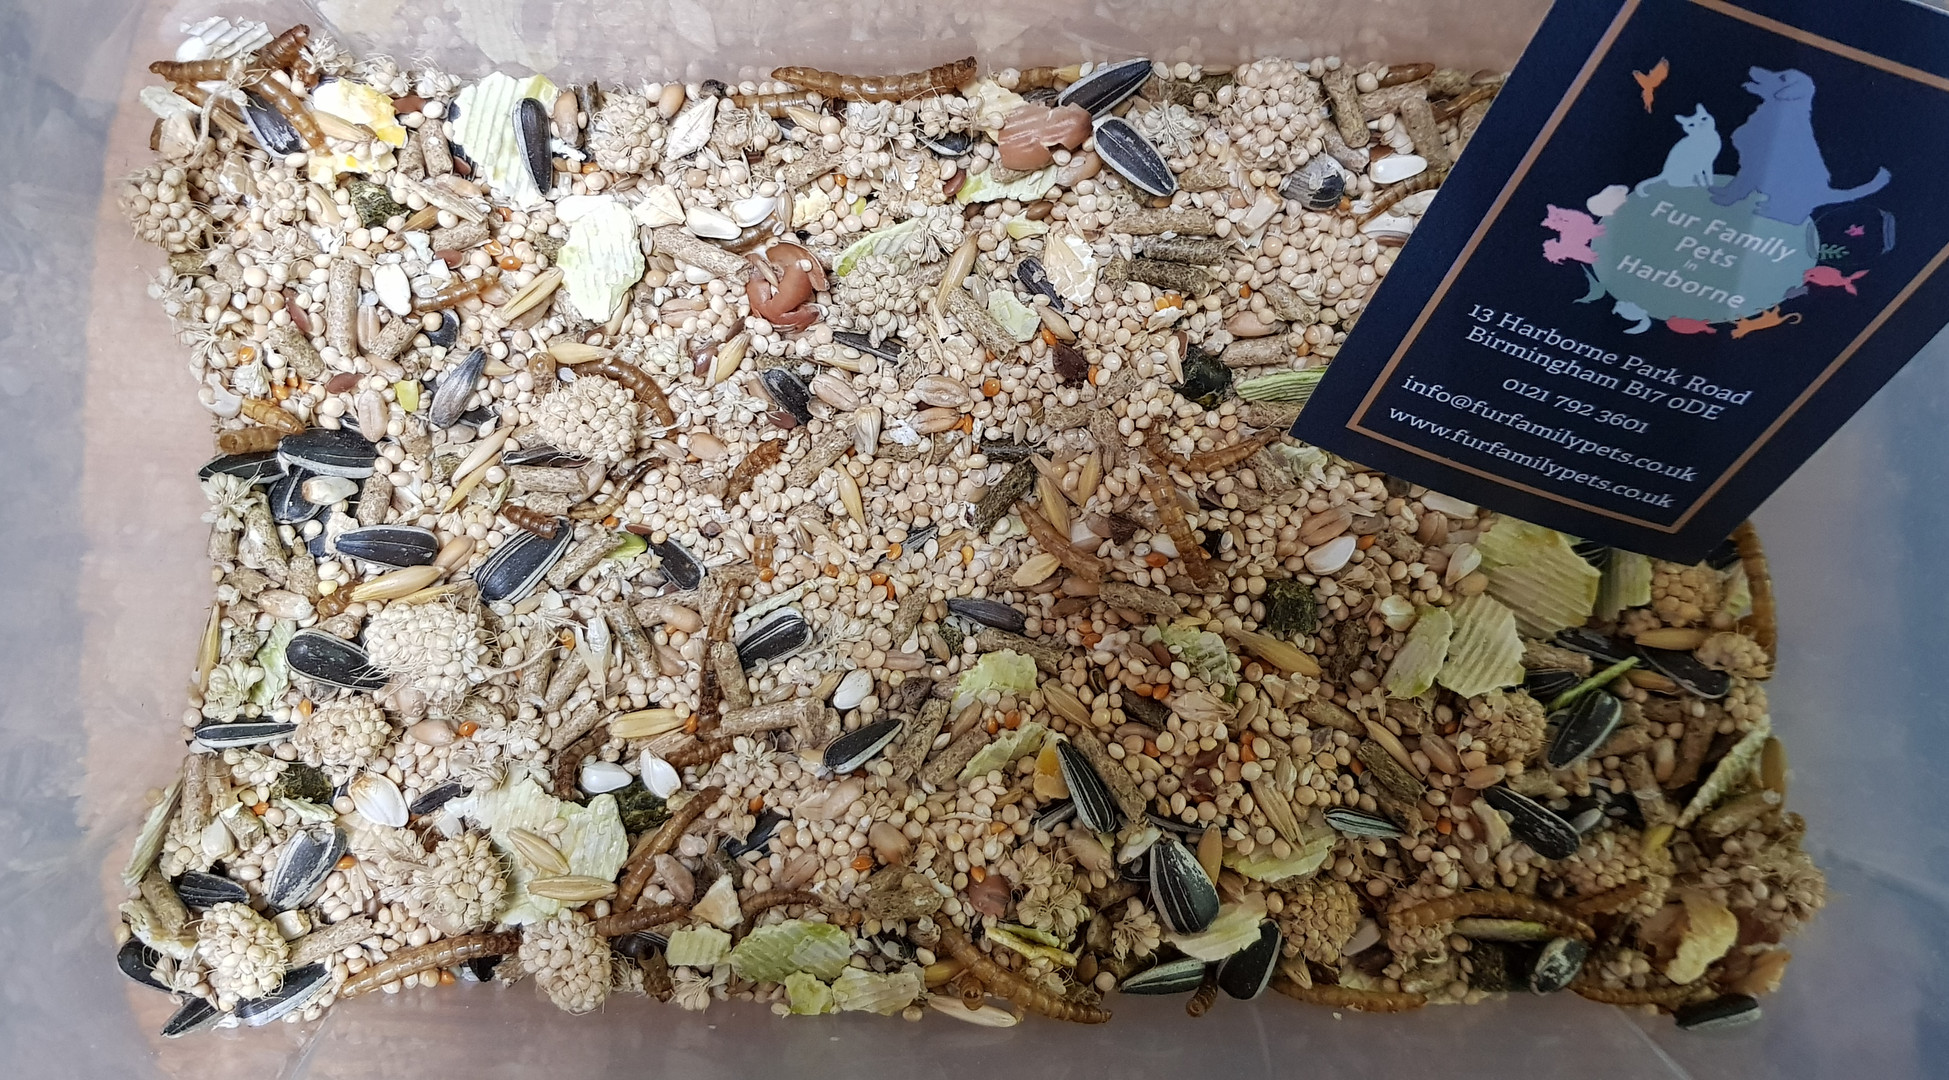 Our own hamster harvest food - same blend as Burgess